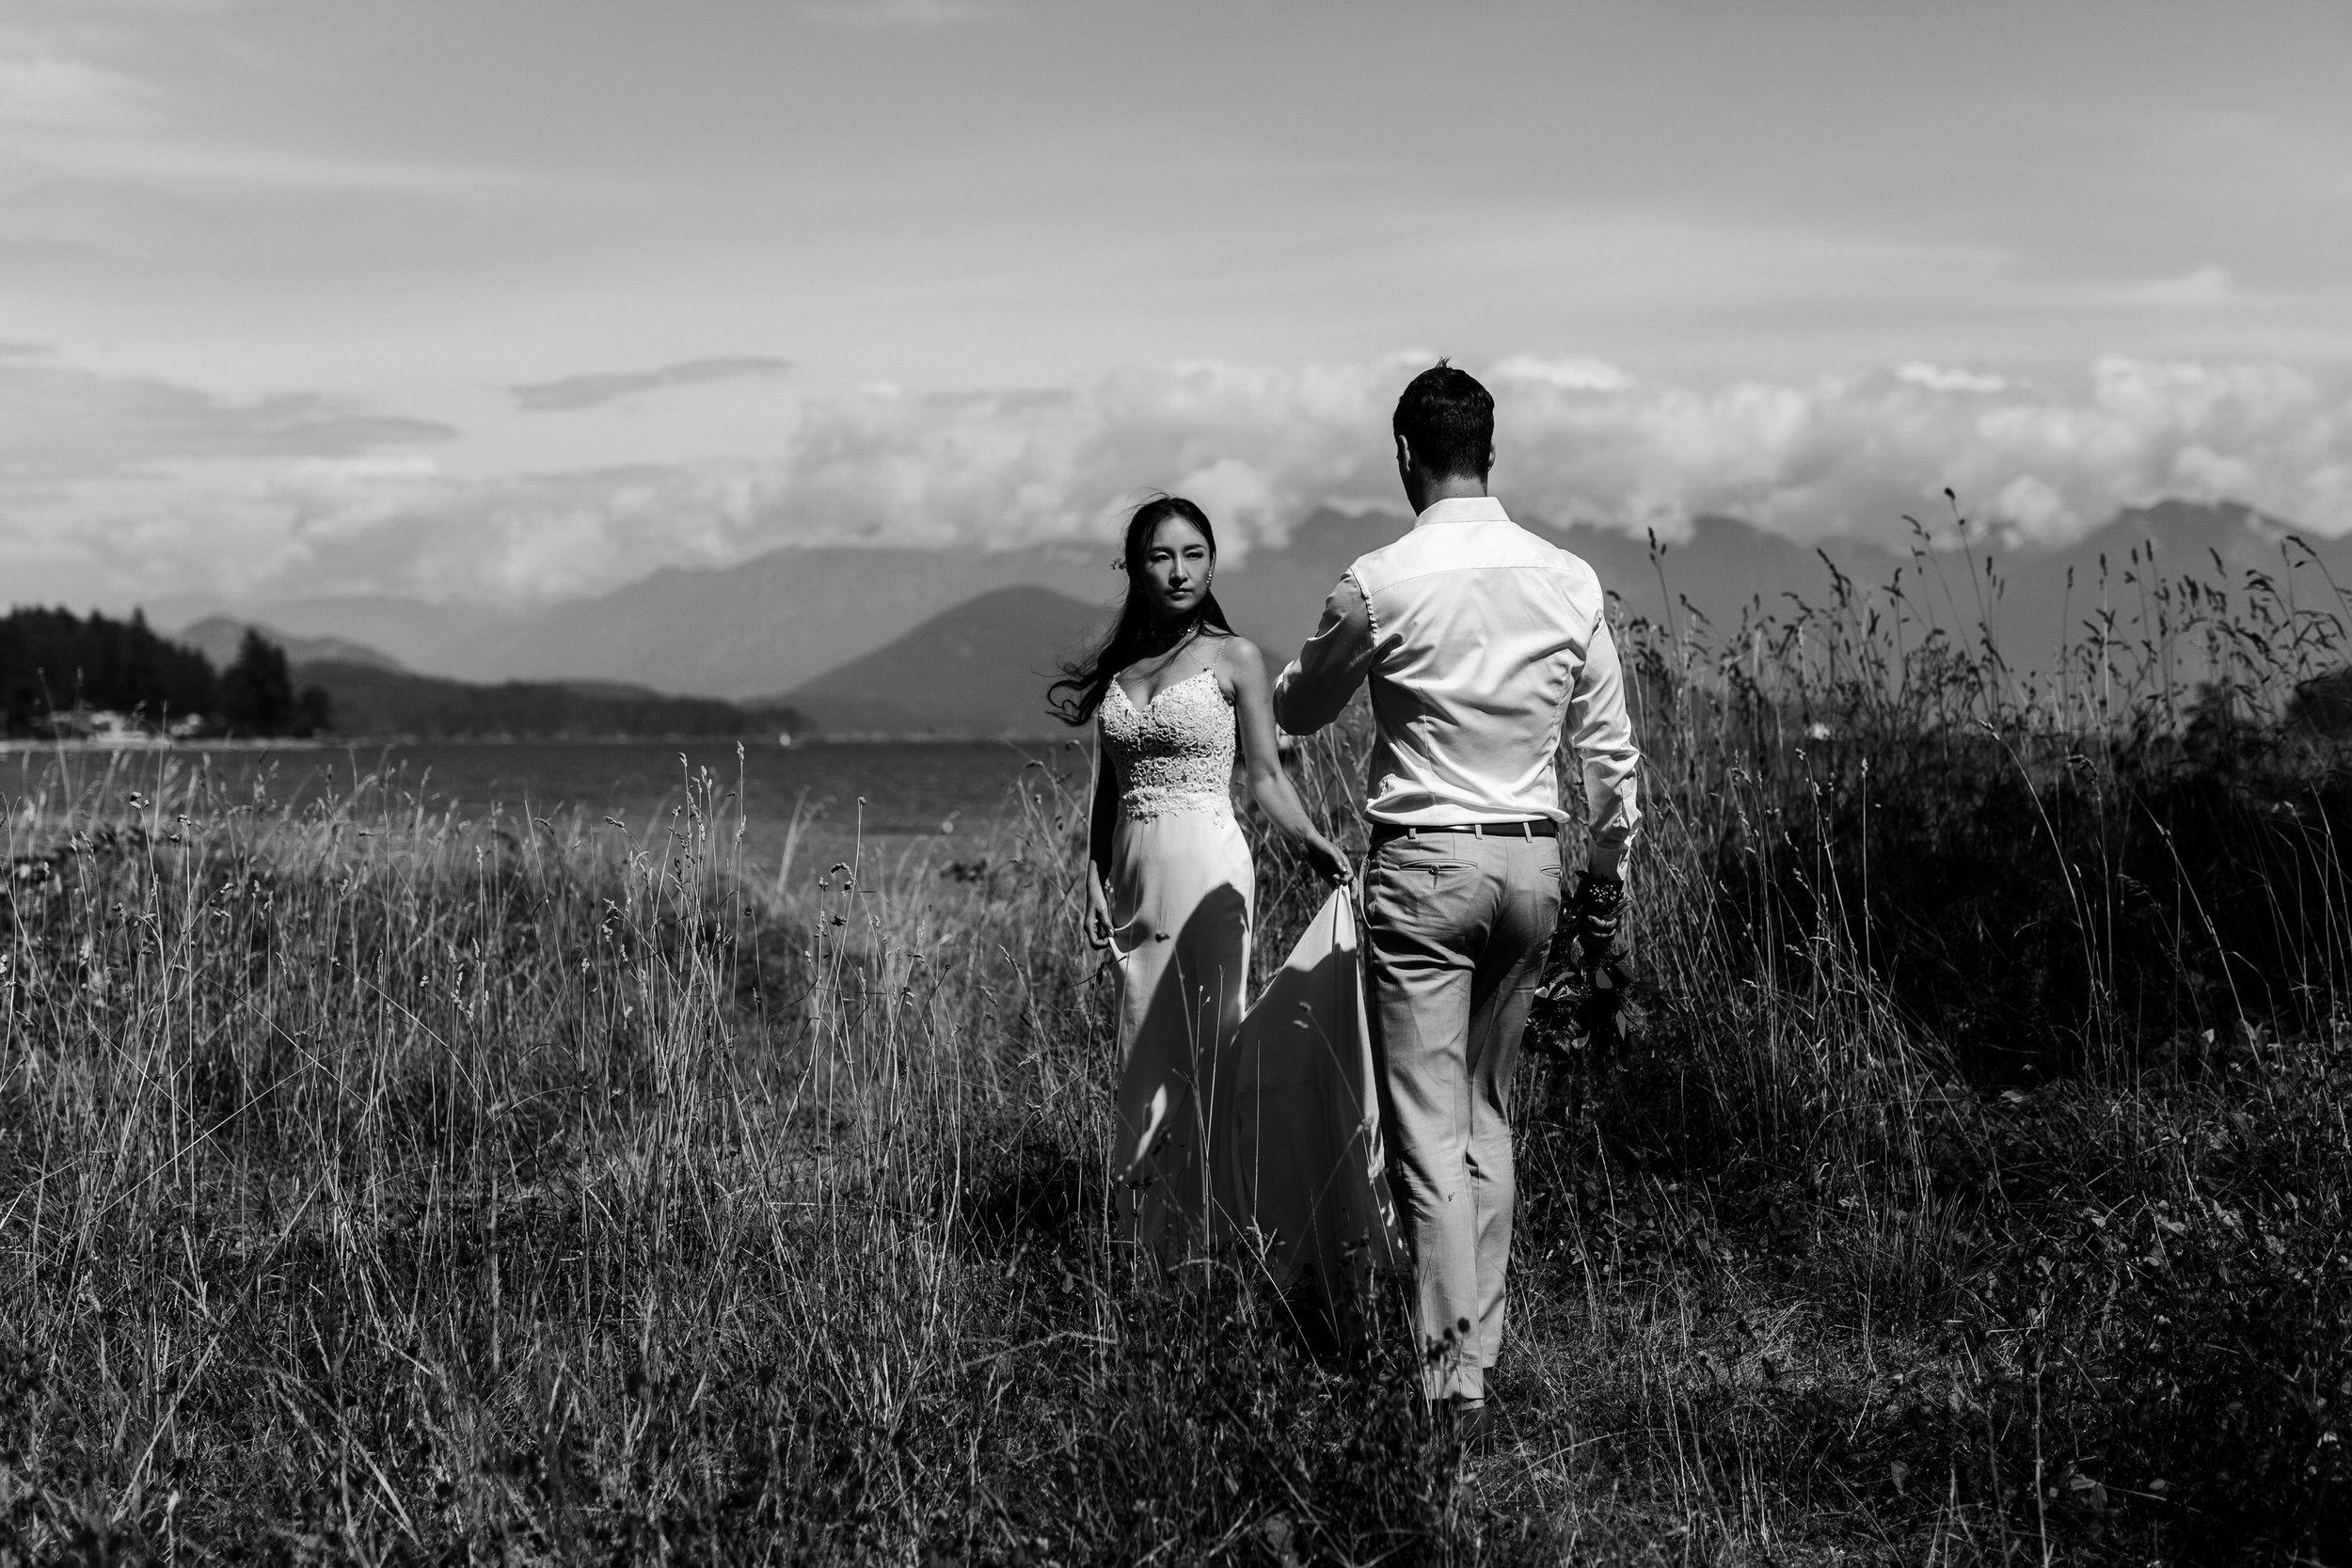 Gibsons Wedding Photos - Sunshine Coast Wedding Photos - Vancouver Wedding Photographer & Videographer - Sunshine Coast Wedding Photos - Sunshine Coast Wedding Photographer - Jennifer Picard Photography - IMG_9816.jpg